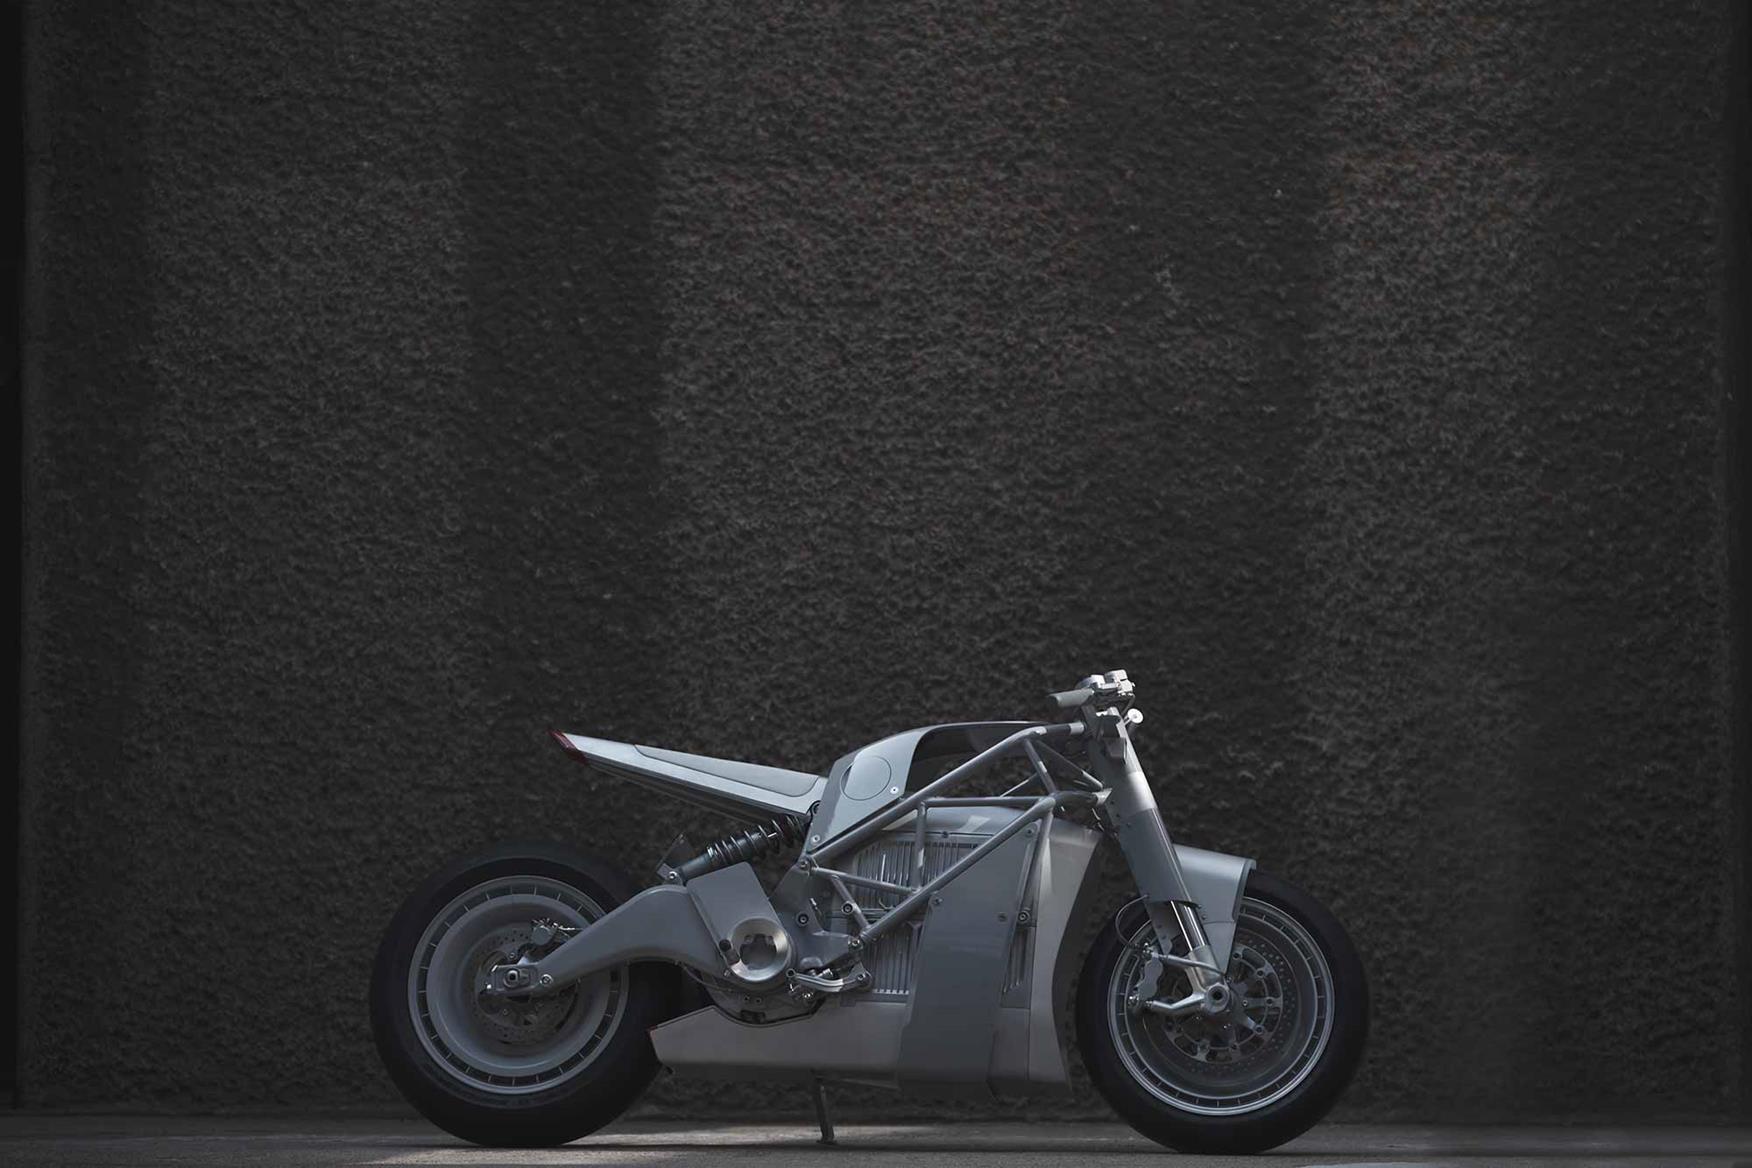 Zero XP custom side view. Credit: Ludovic Robert.